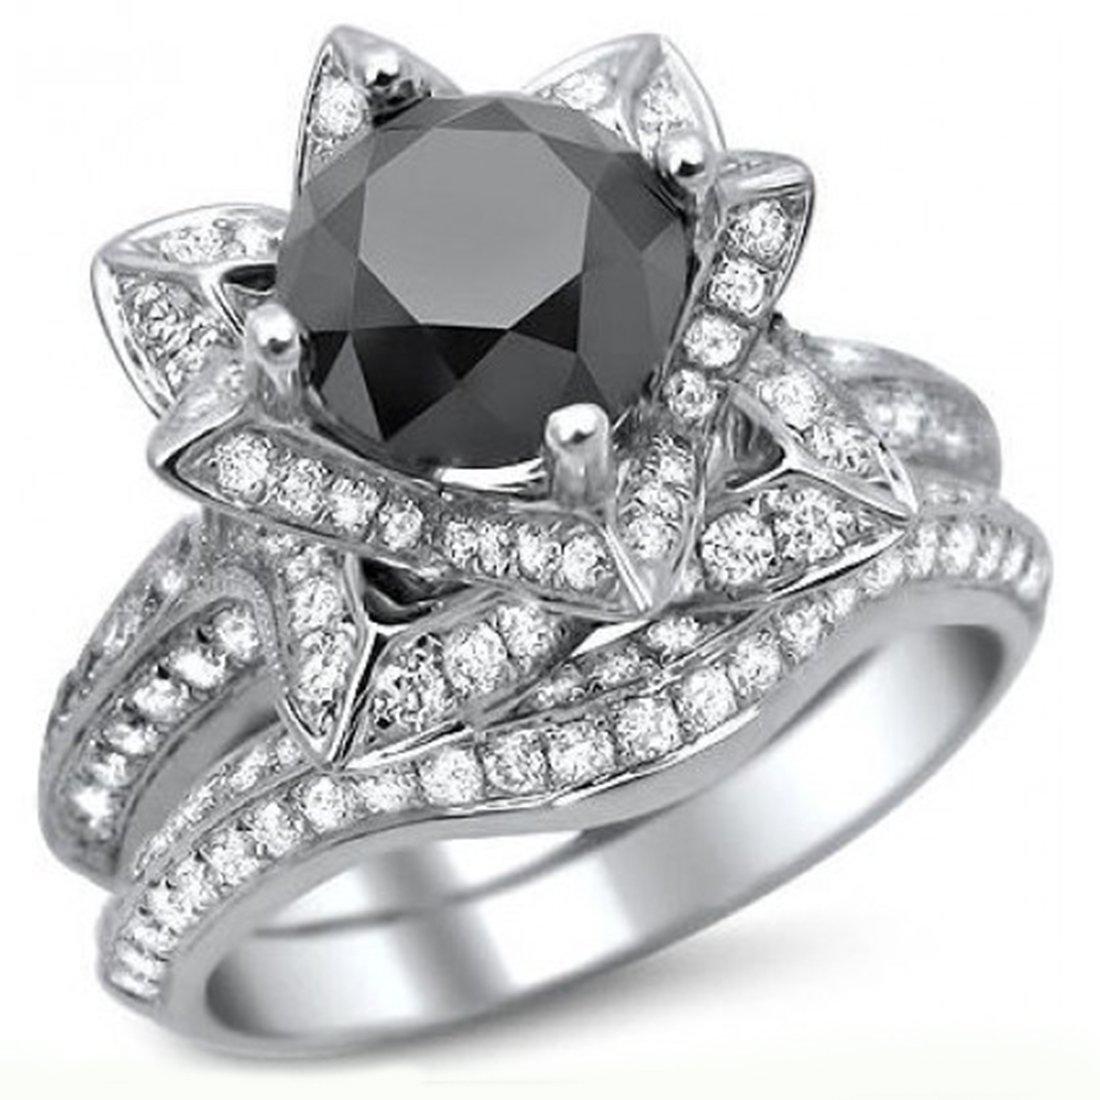 Smjewels 3.55 Ct Black Round Sim.Diamond Lotus Flower Engagement Ring Set In 14K White Gold Fn